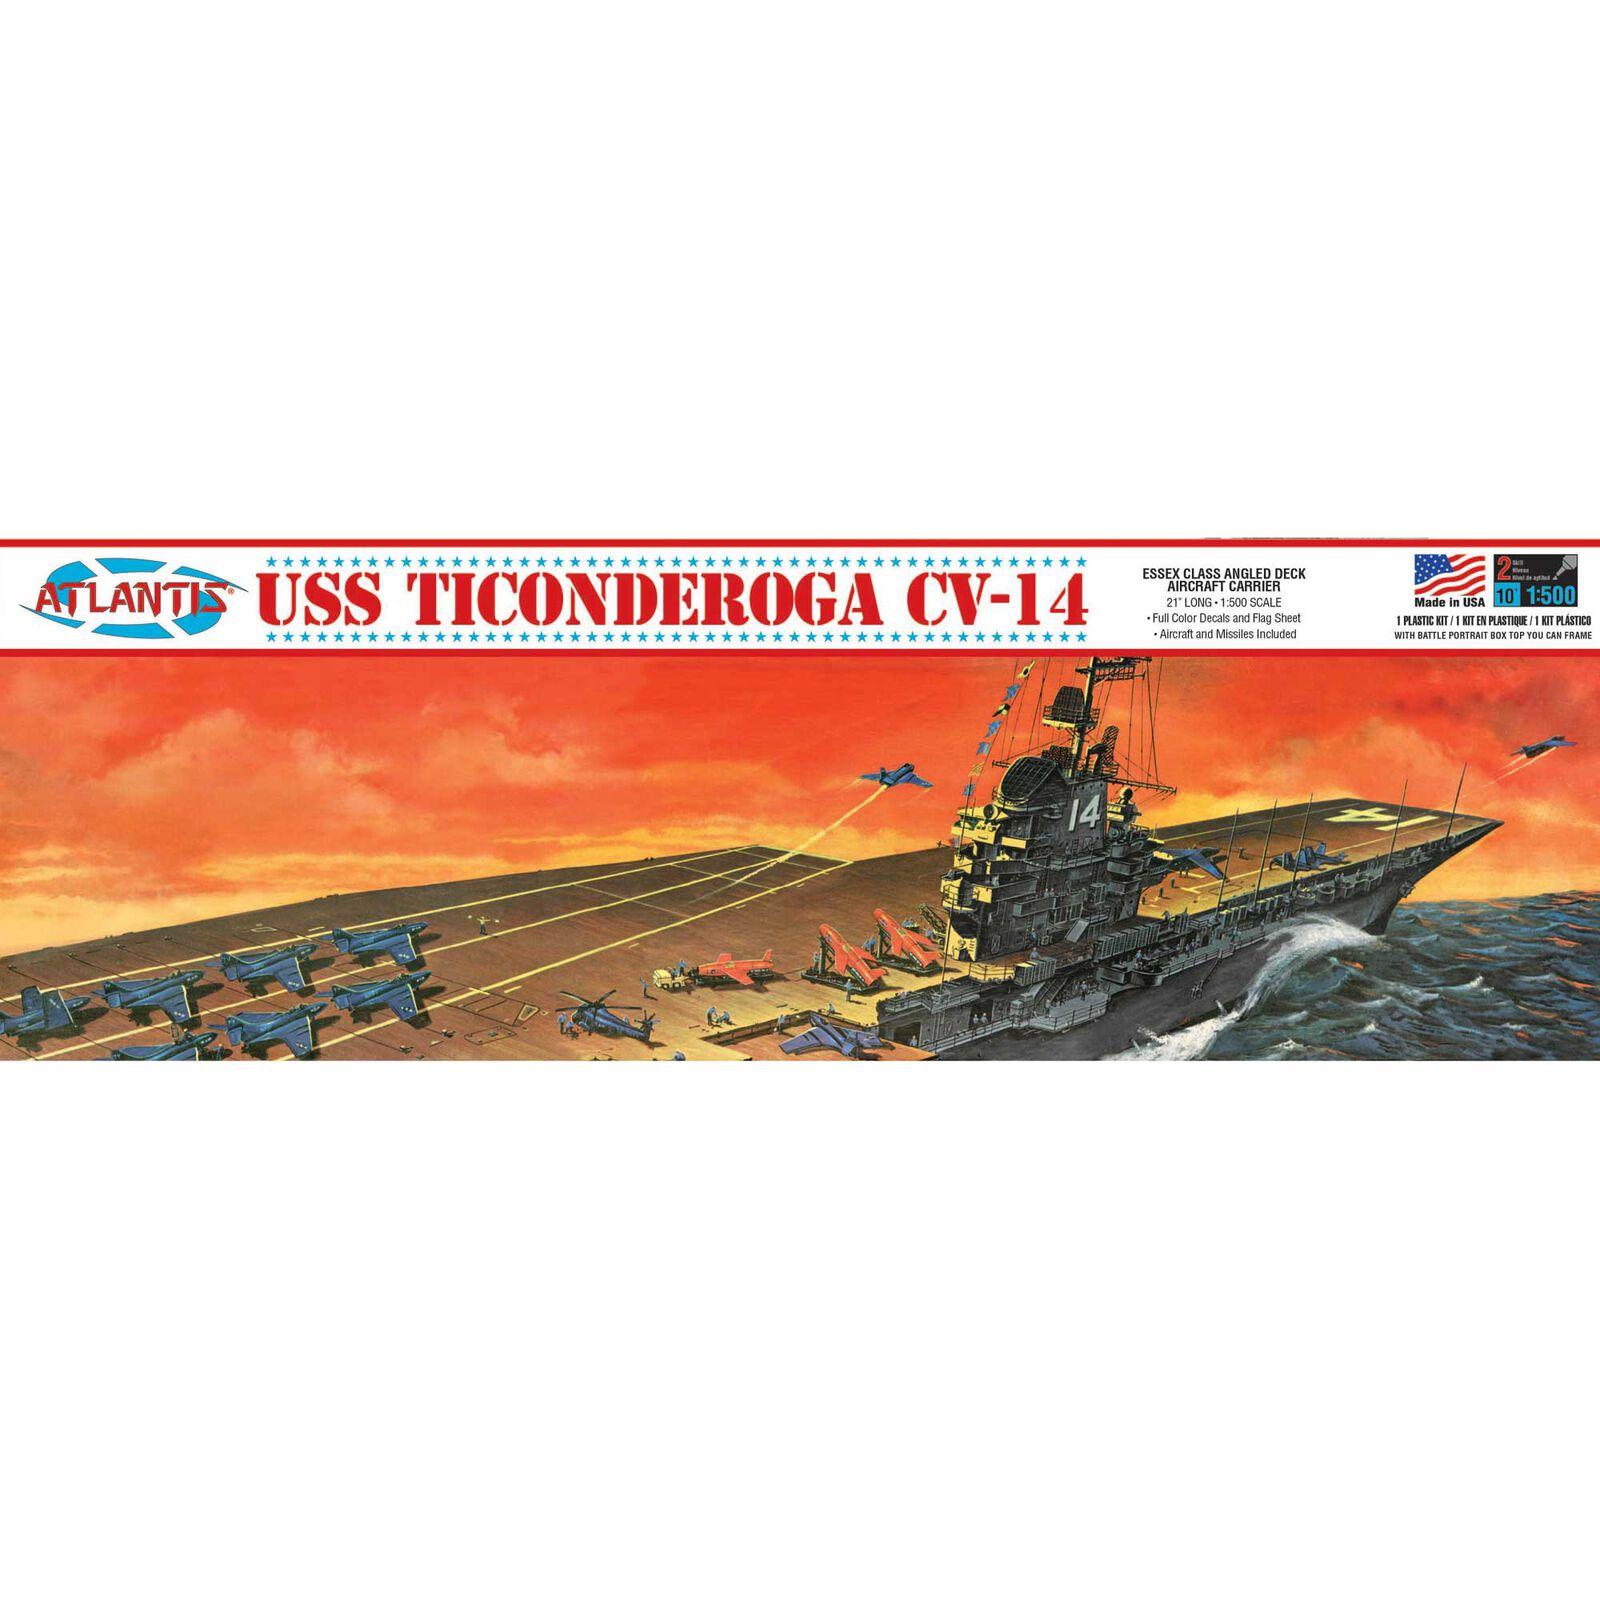 USS Ticonderoga CV-14 Aircraft Carrier 1 500